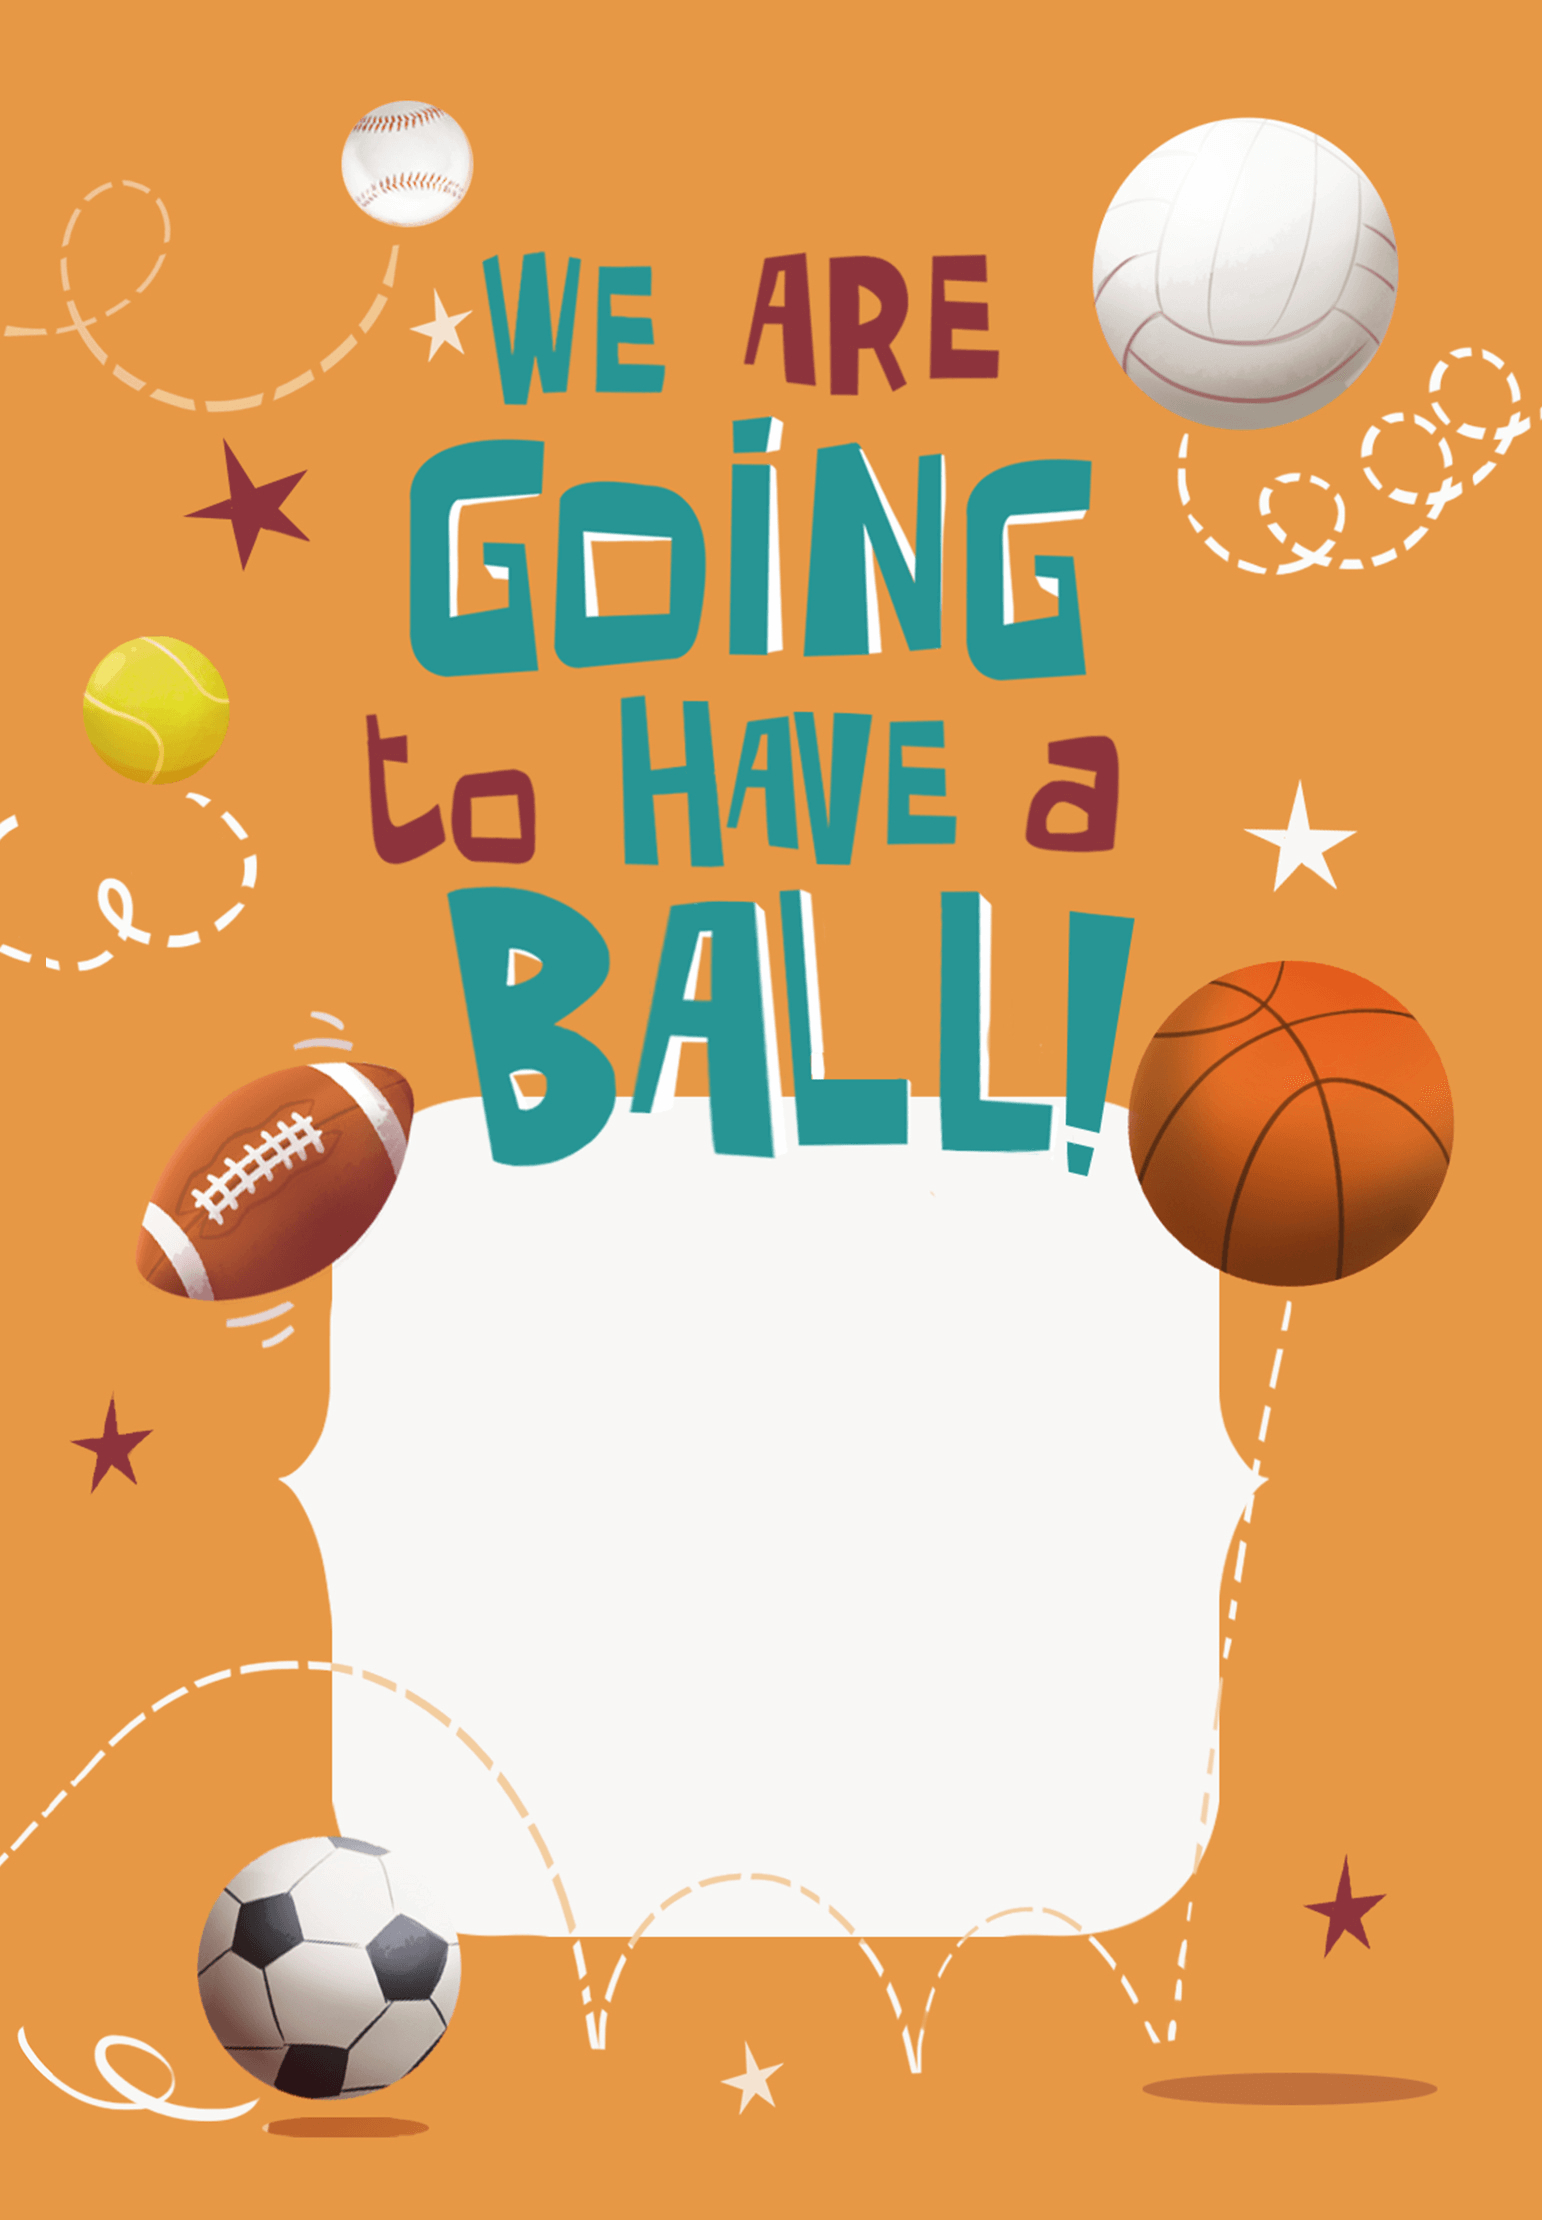 Celebrate 6Th Birthday - Free Printable Sports & Games Invitation - Free Printable Sports Birthday Invitation Templates